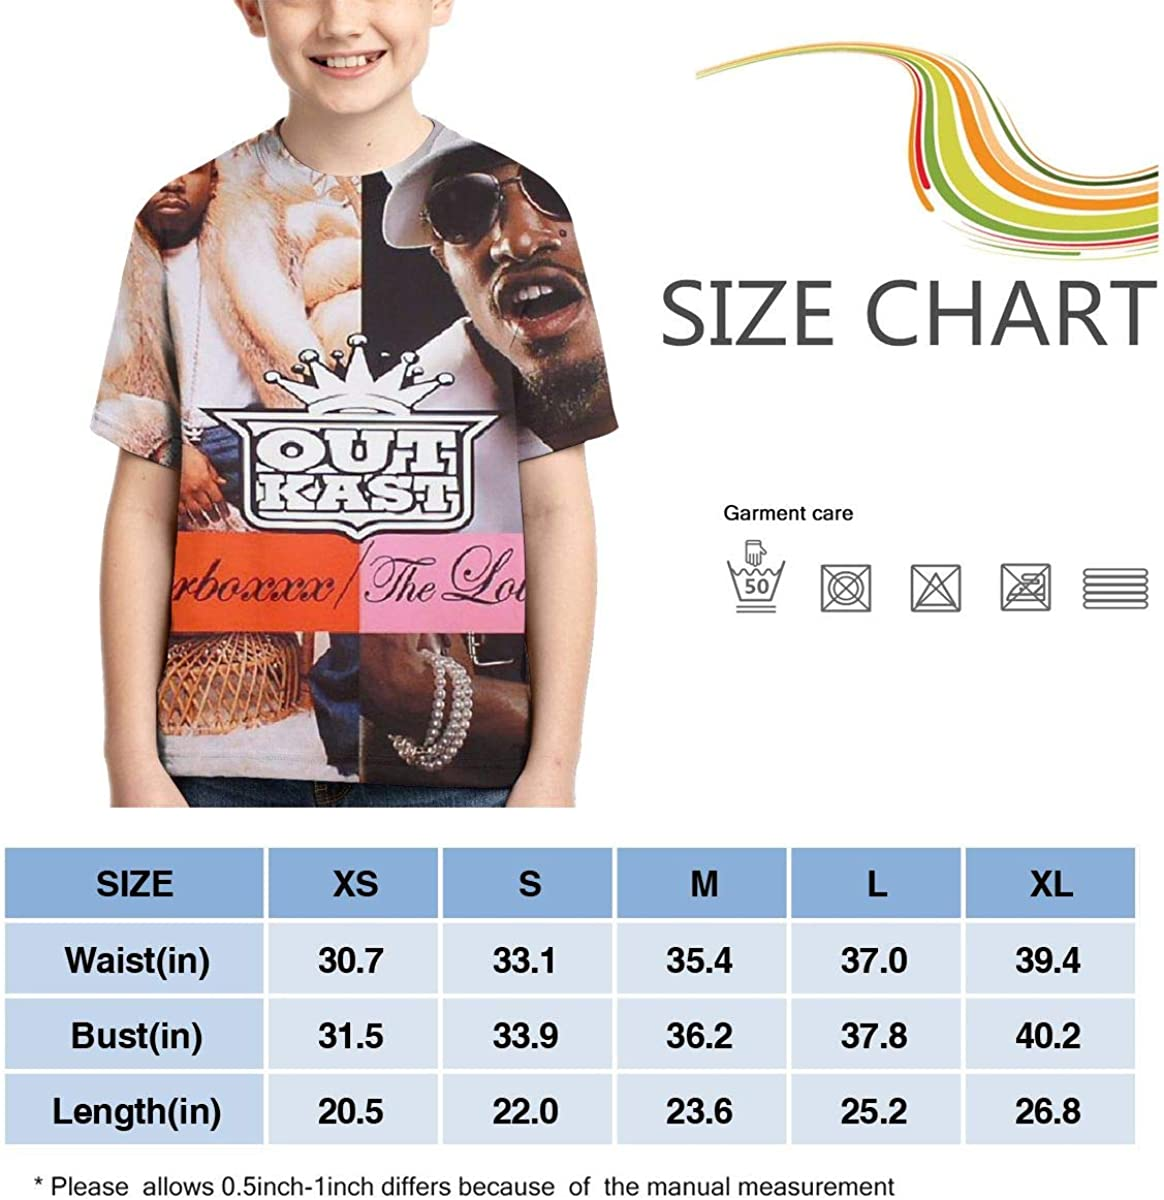 Outkast Speakerbox The Love Below Boys Girls 3D Print Short Sleeve Outdoor T-Shirt Tops Black